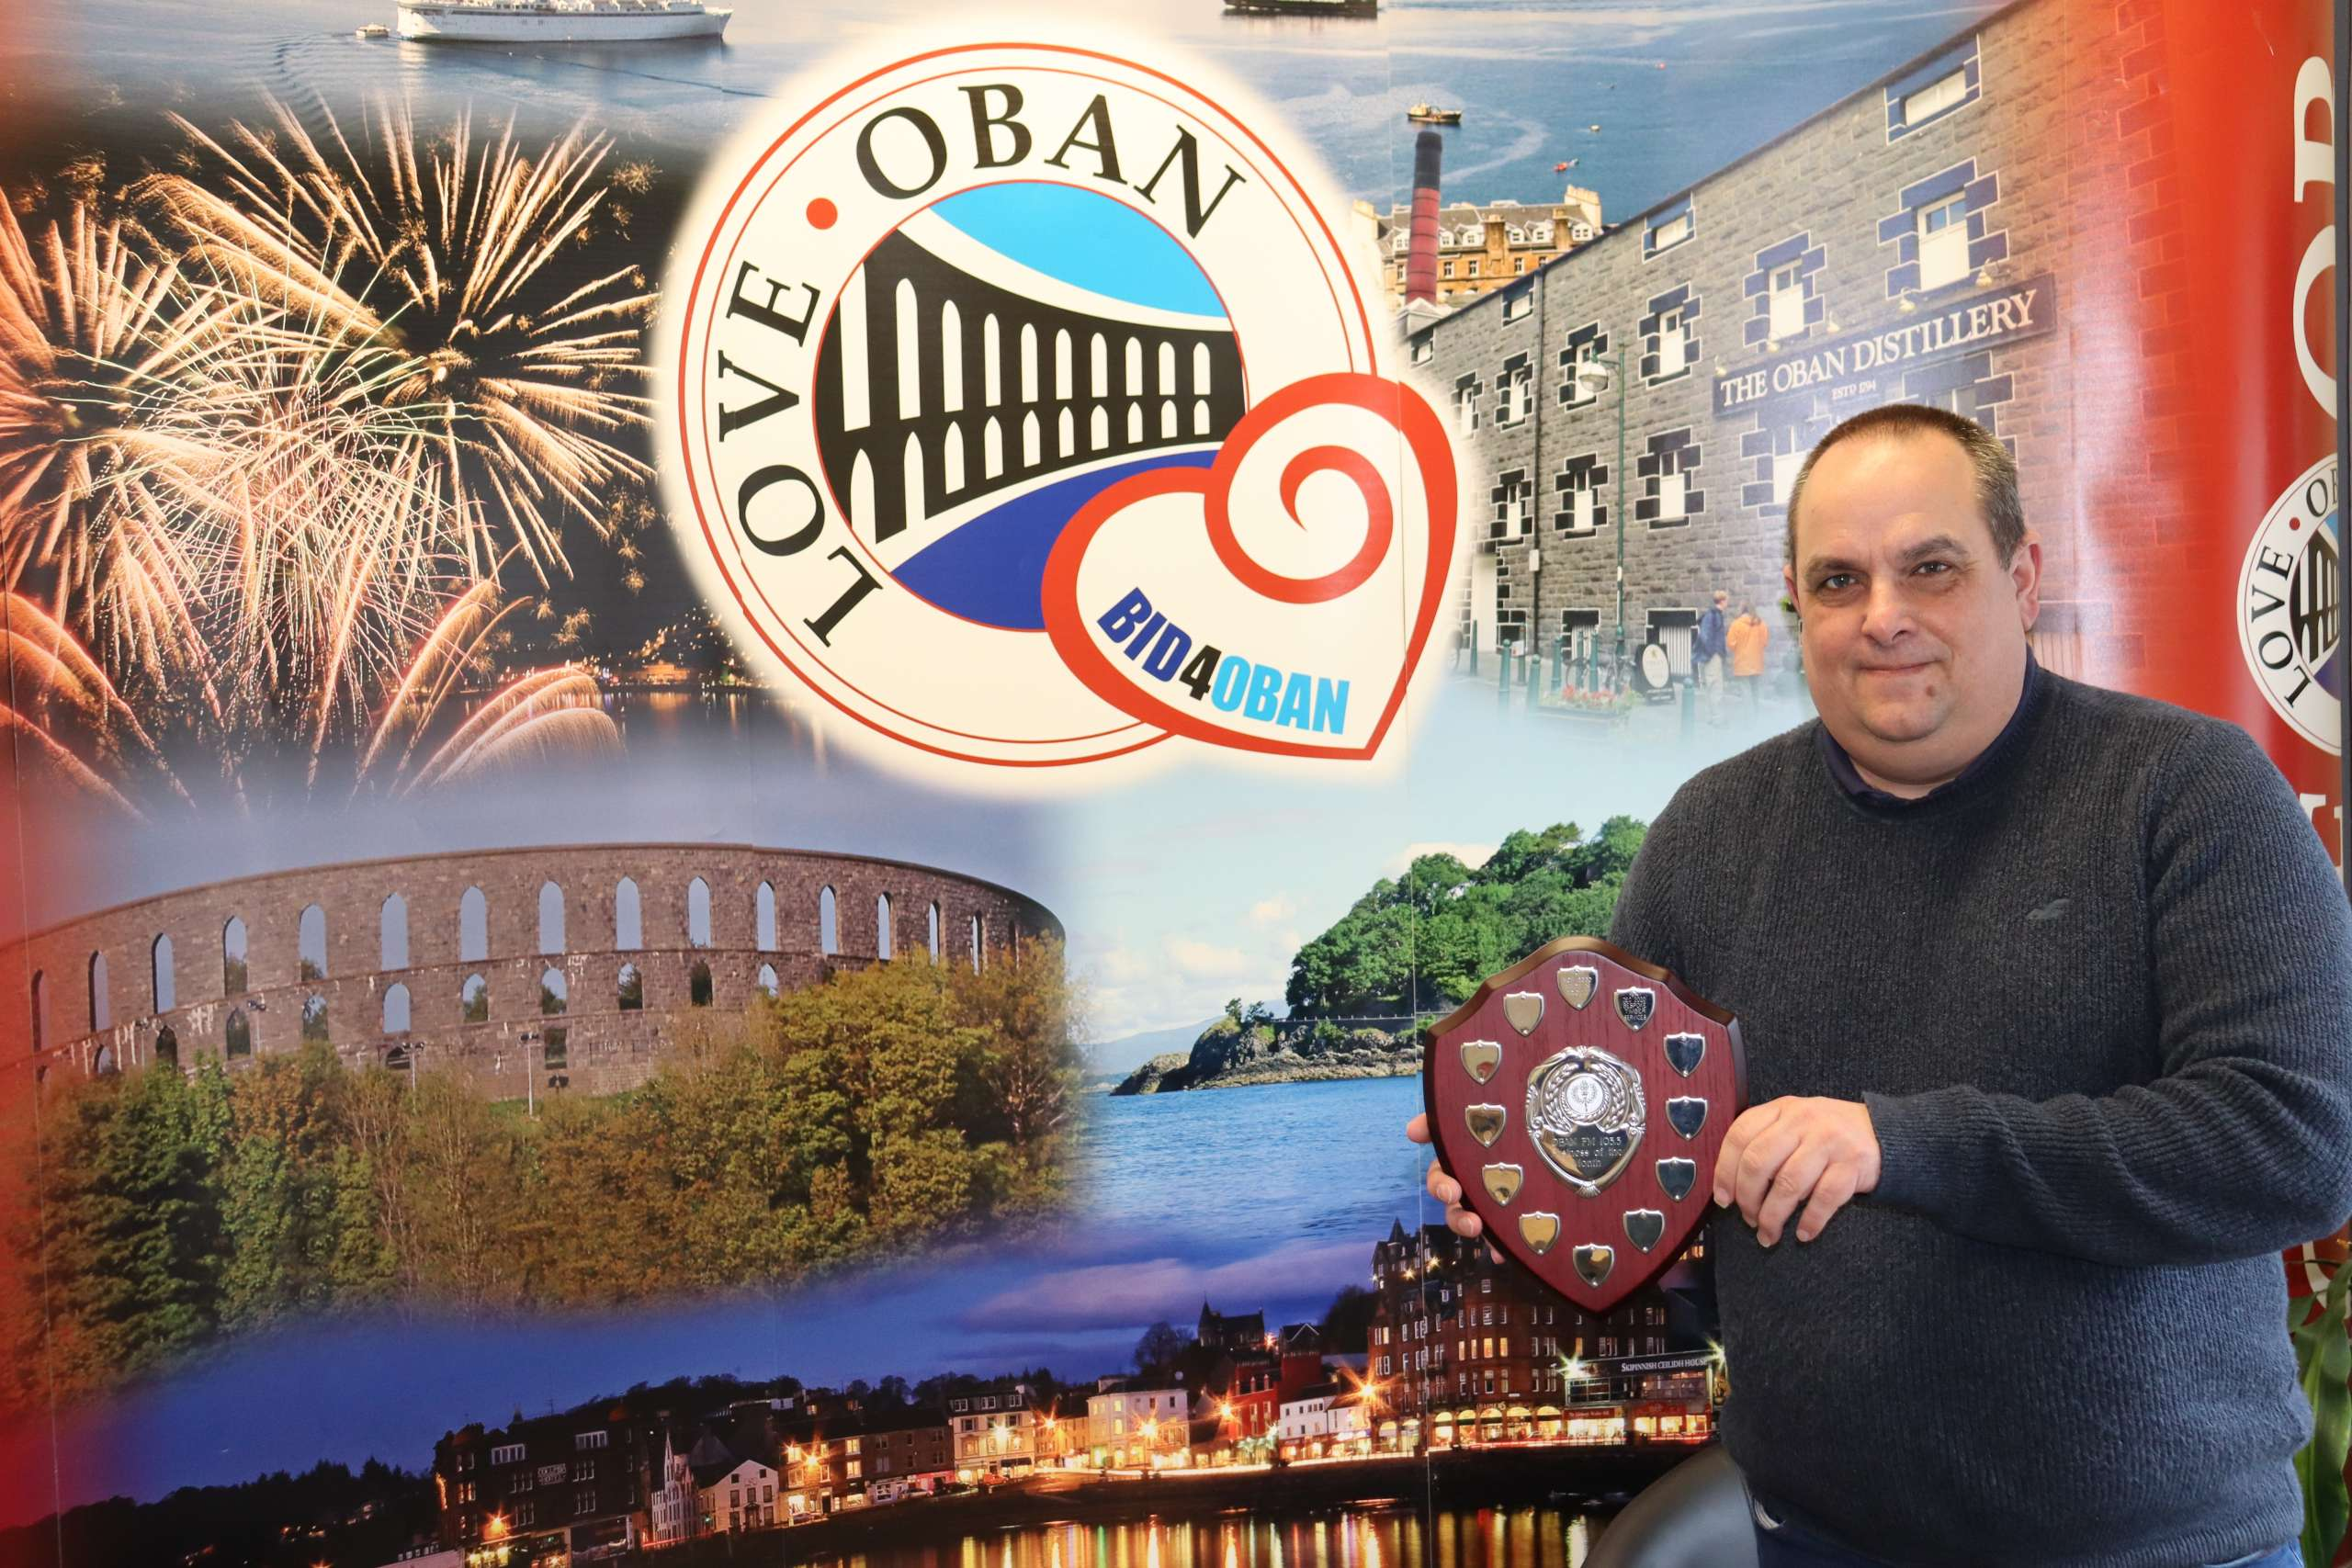 BID4Oban chosen as Oban FM's business of the month